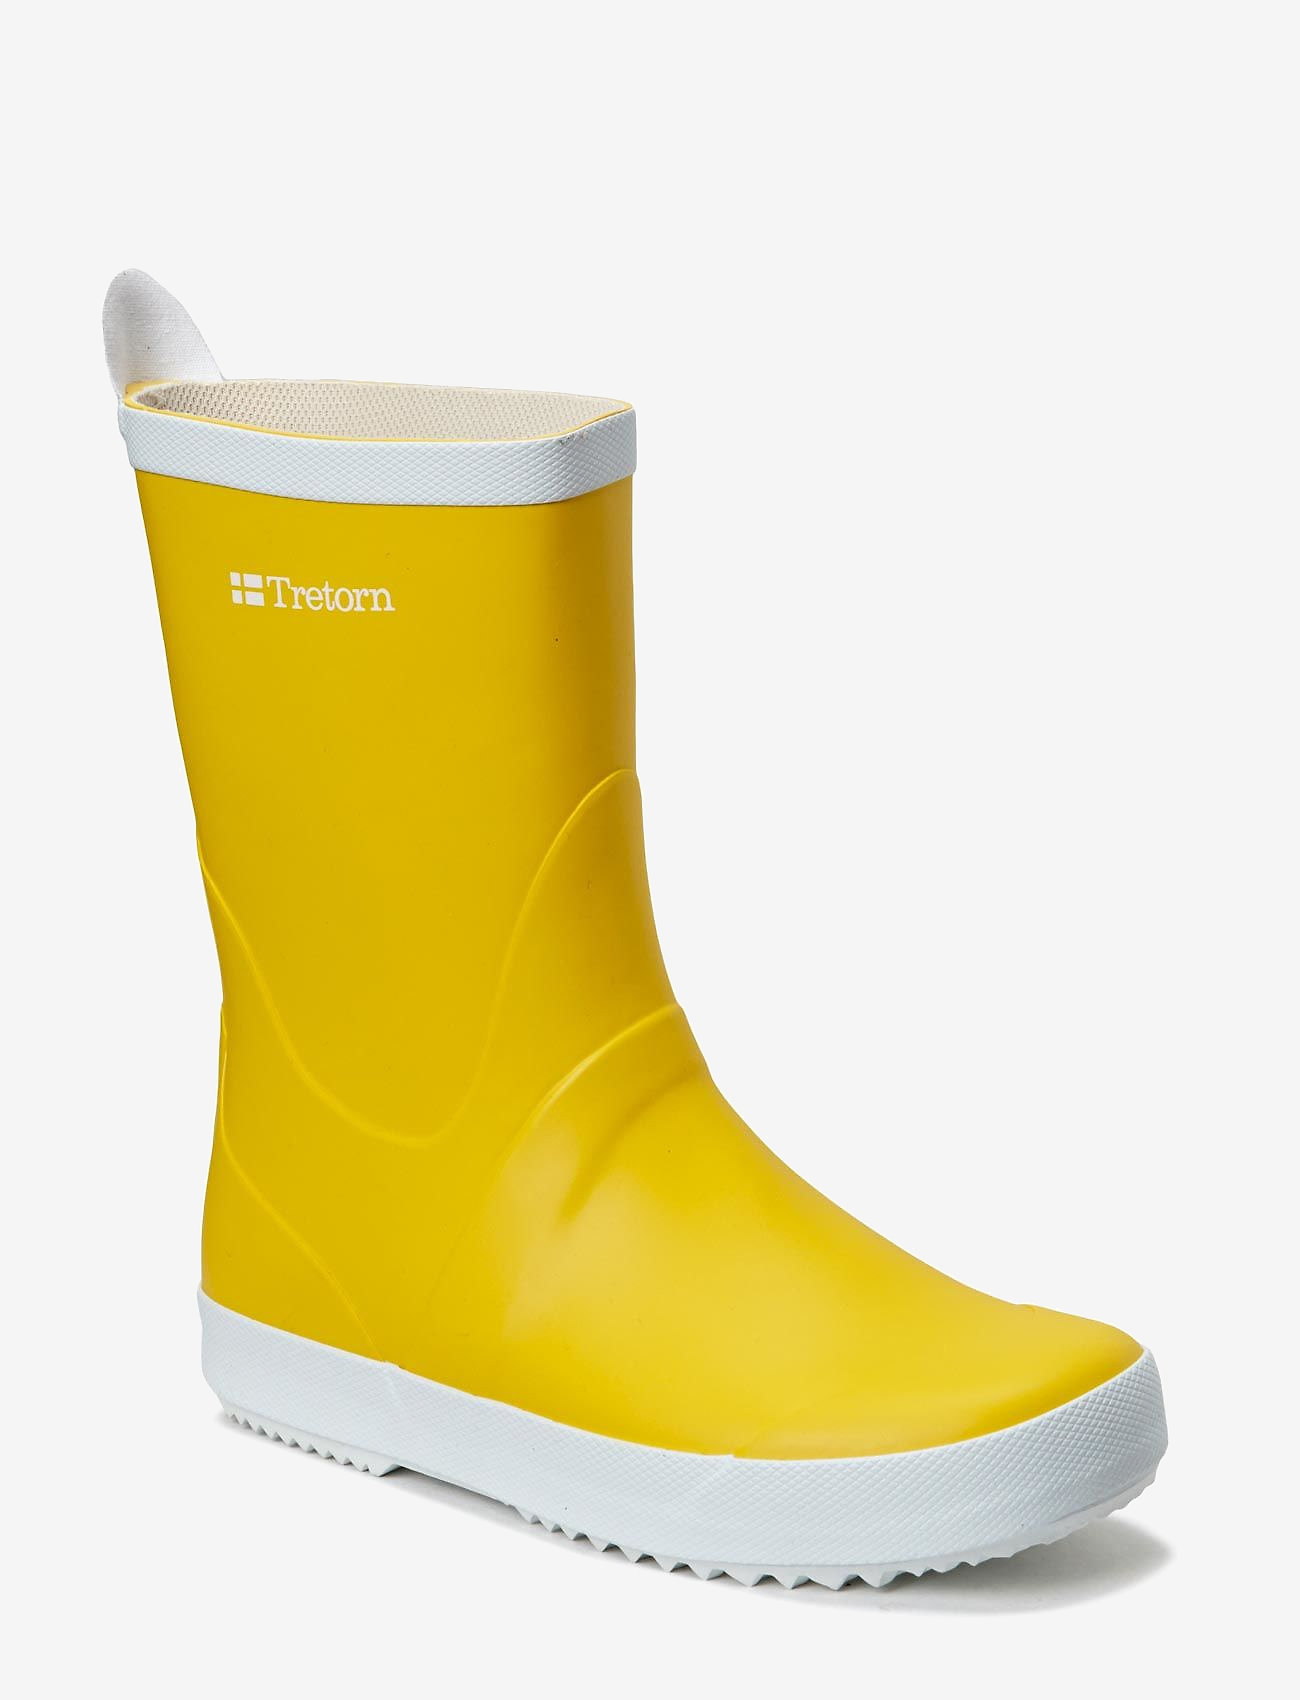 Tretorn - WINGS - gummistiefel - yellow - 0